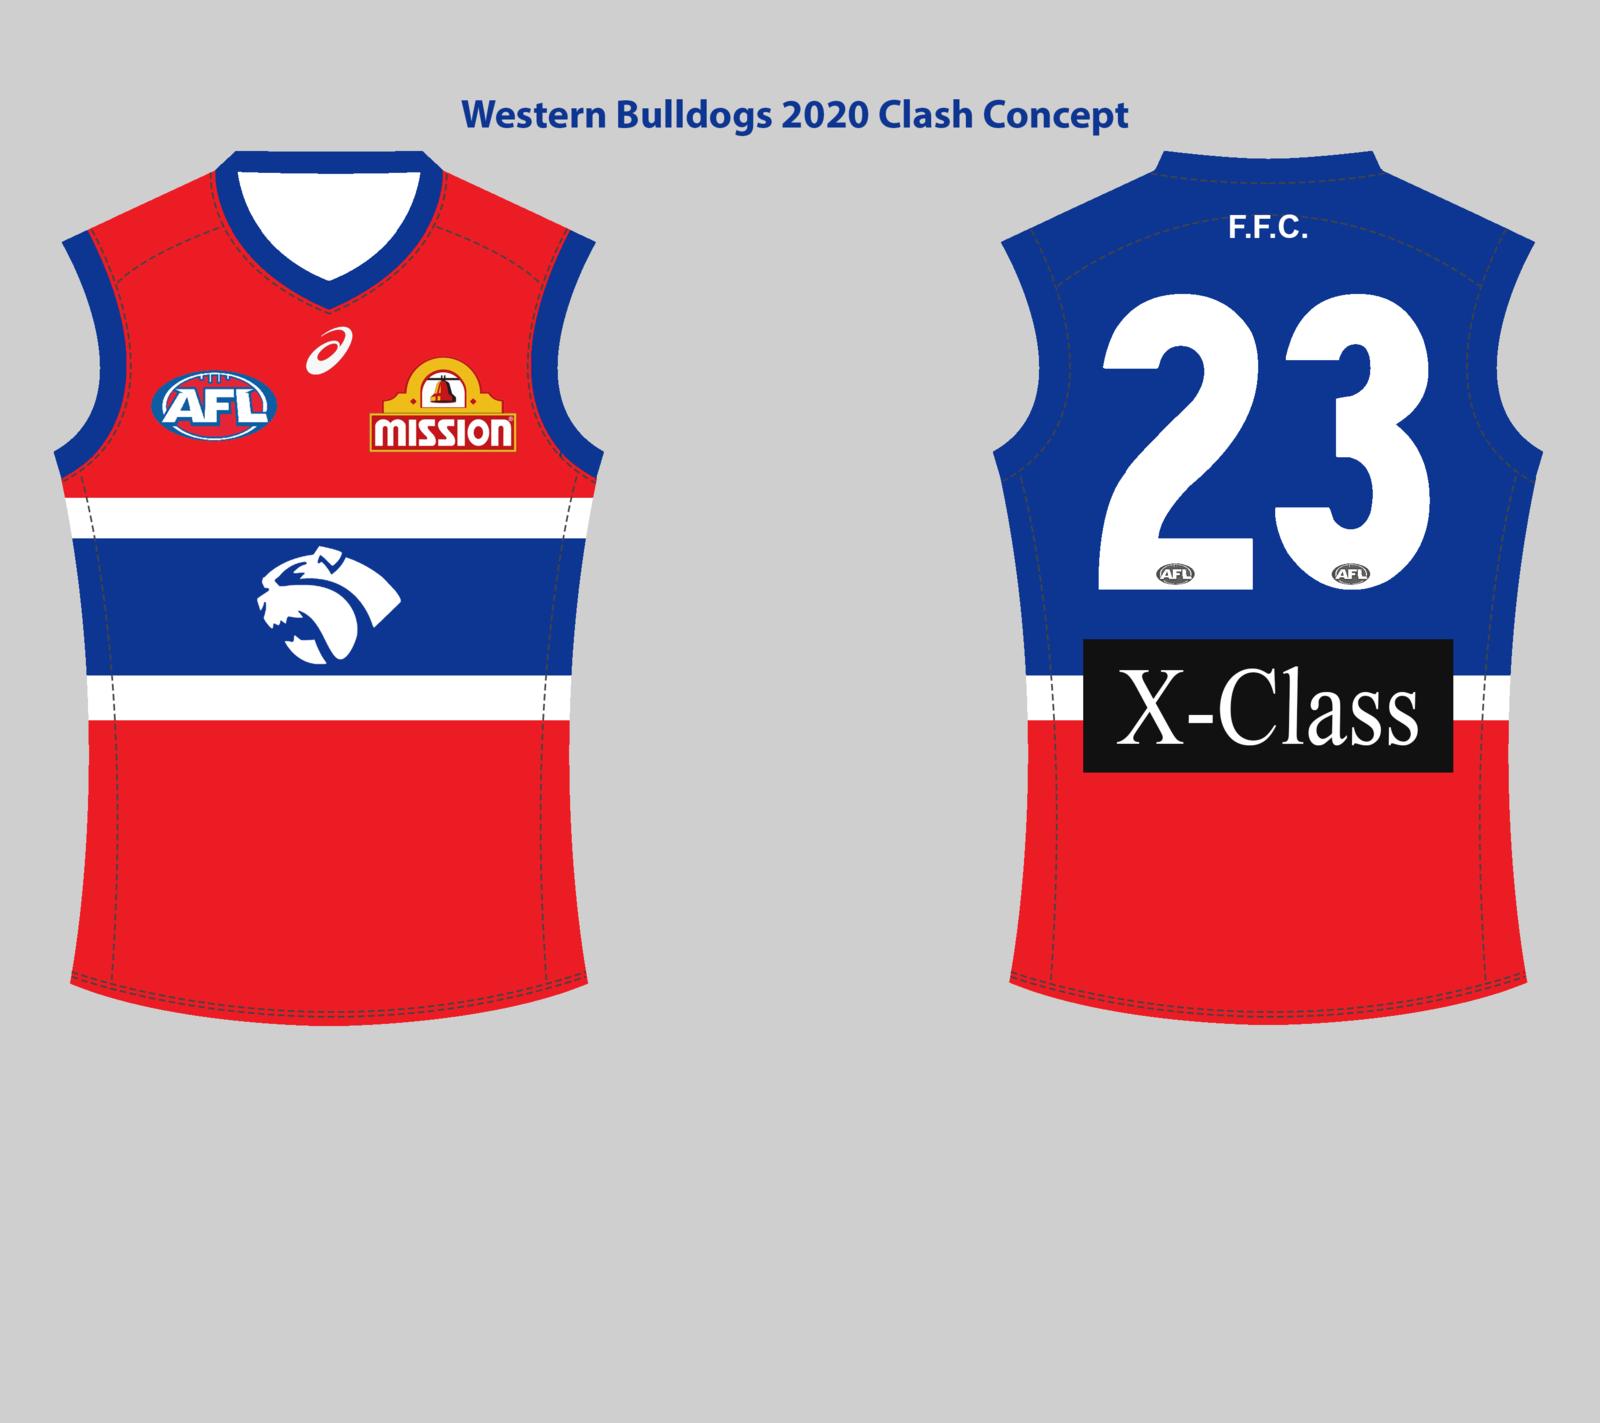 Western Bulldogs 2020 Clash3.png